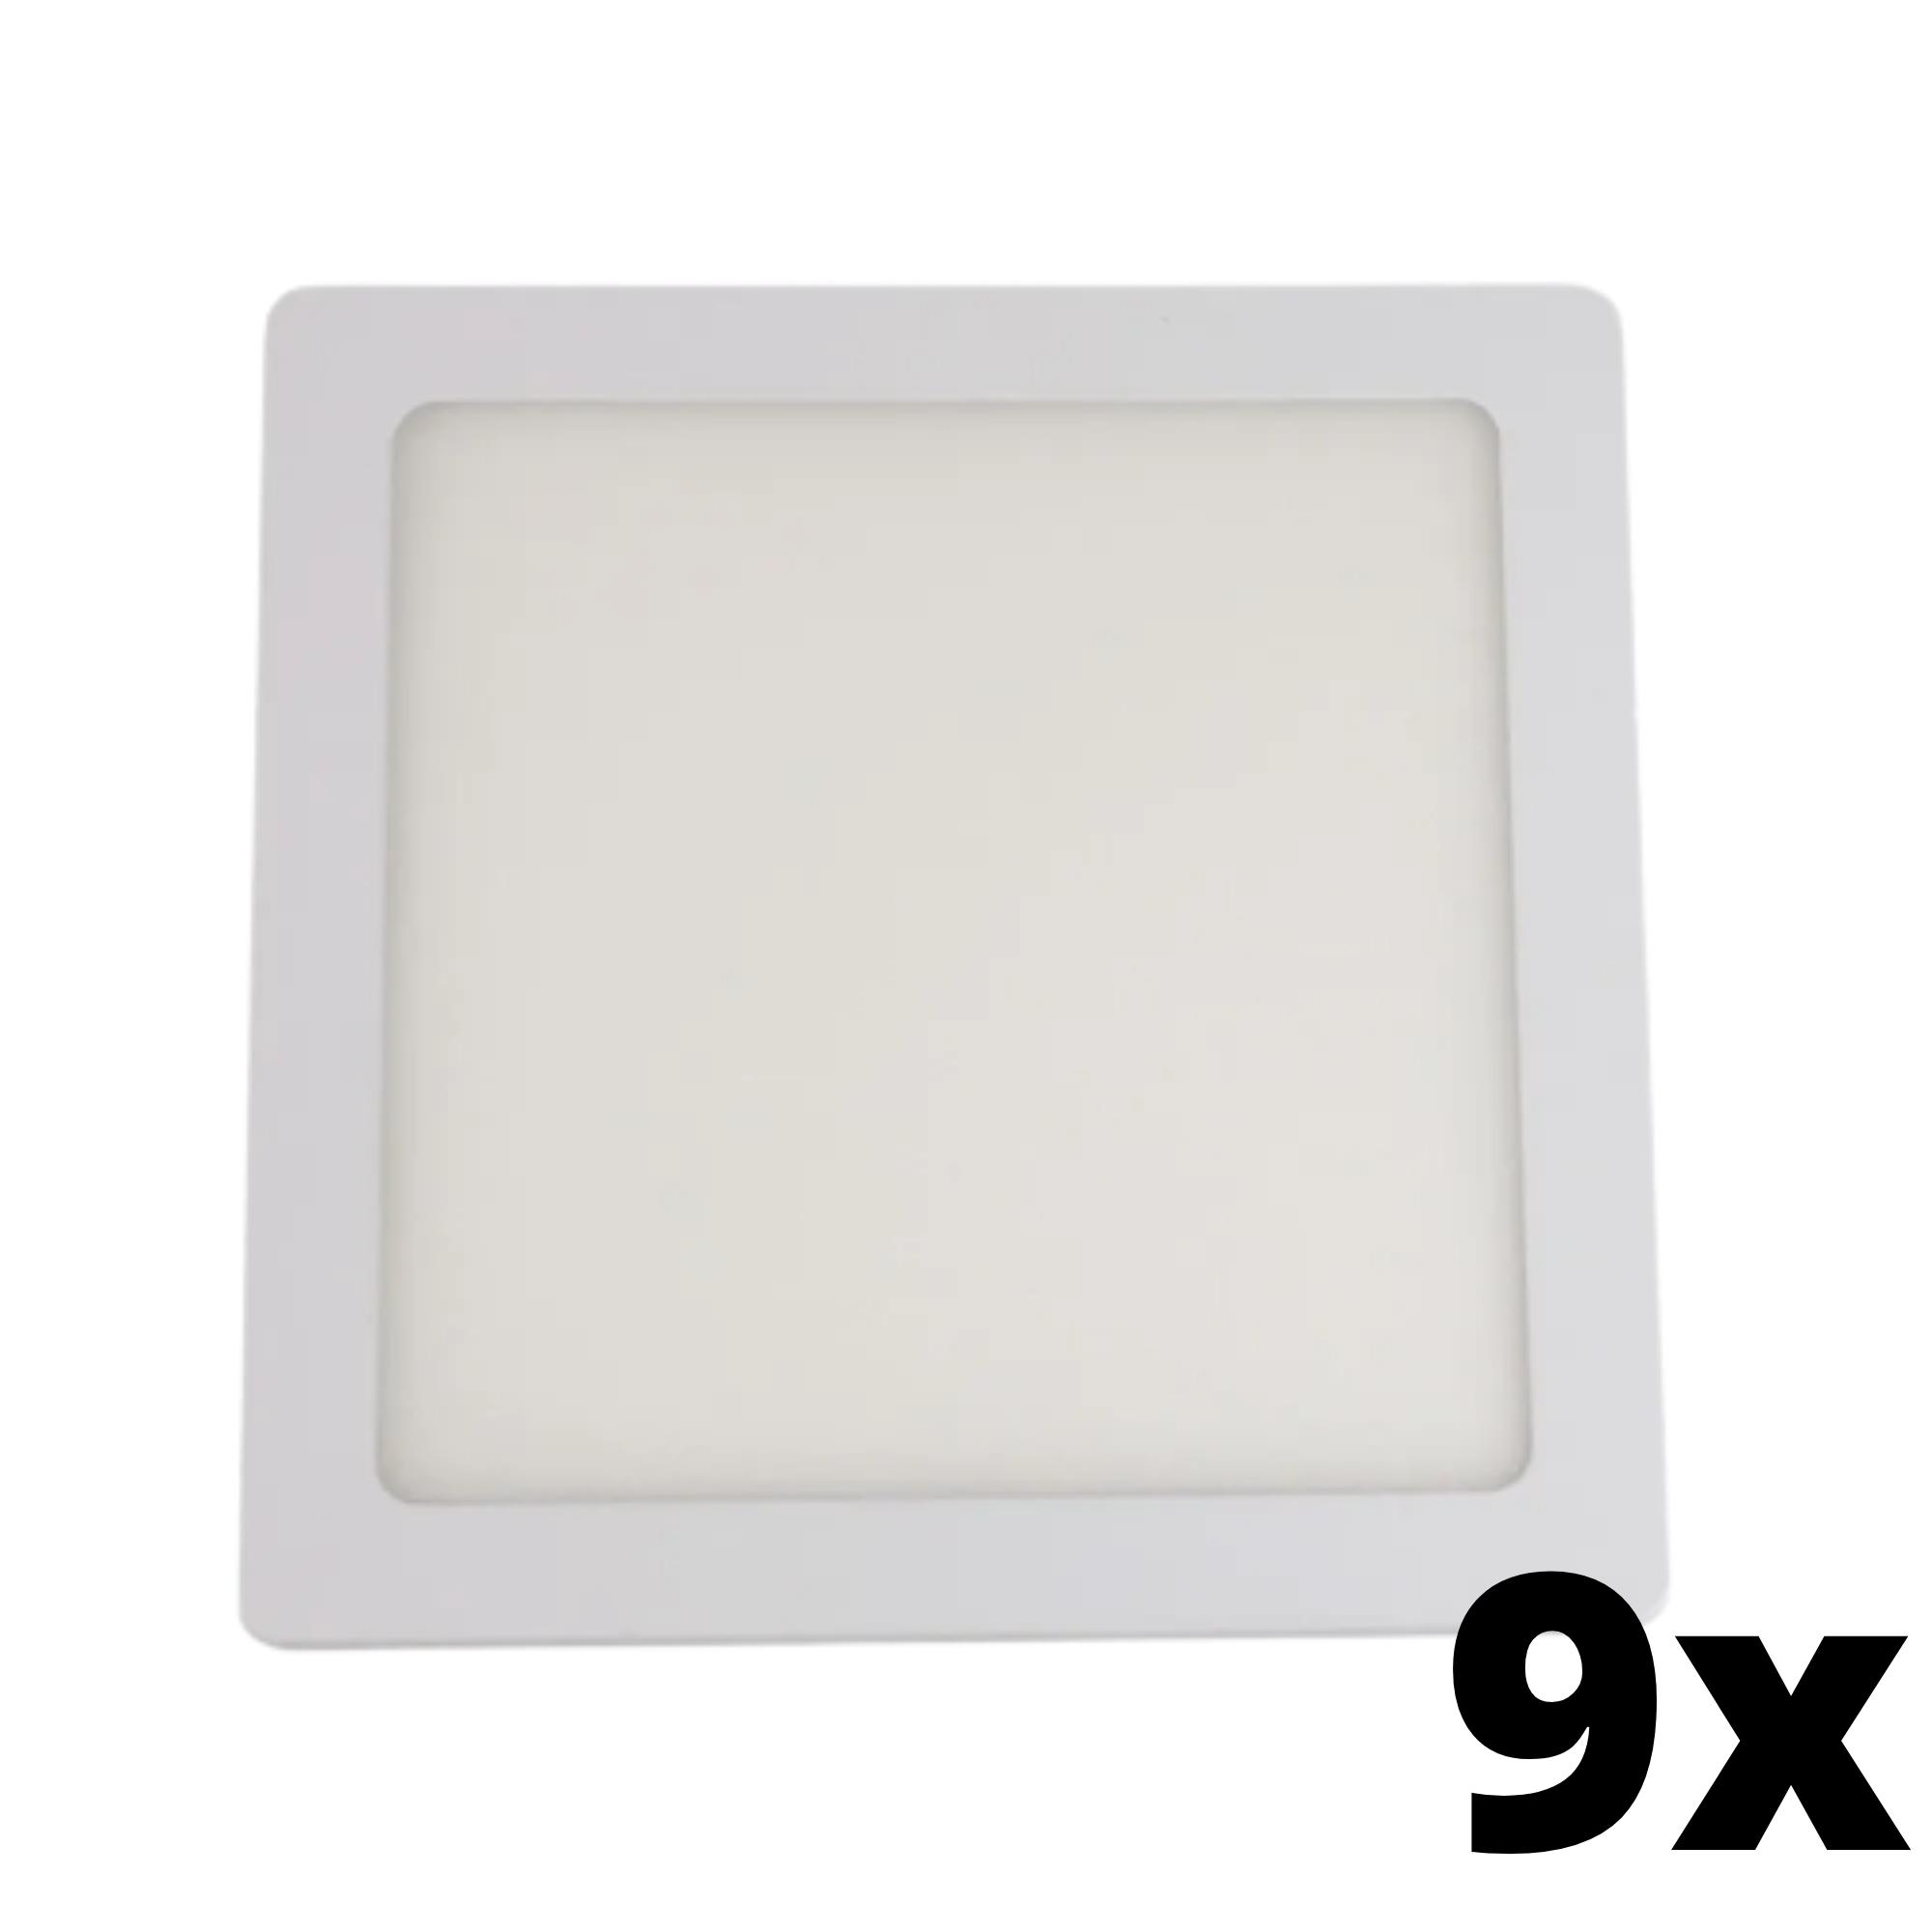 Kit 9 und Painel de Led Embutir 12w Quadrado 3000k